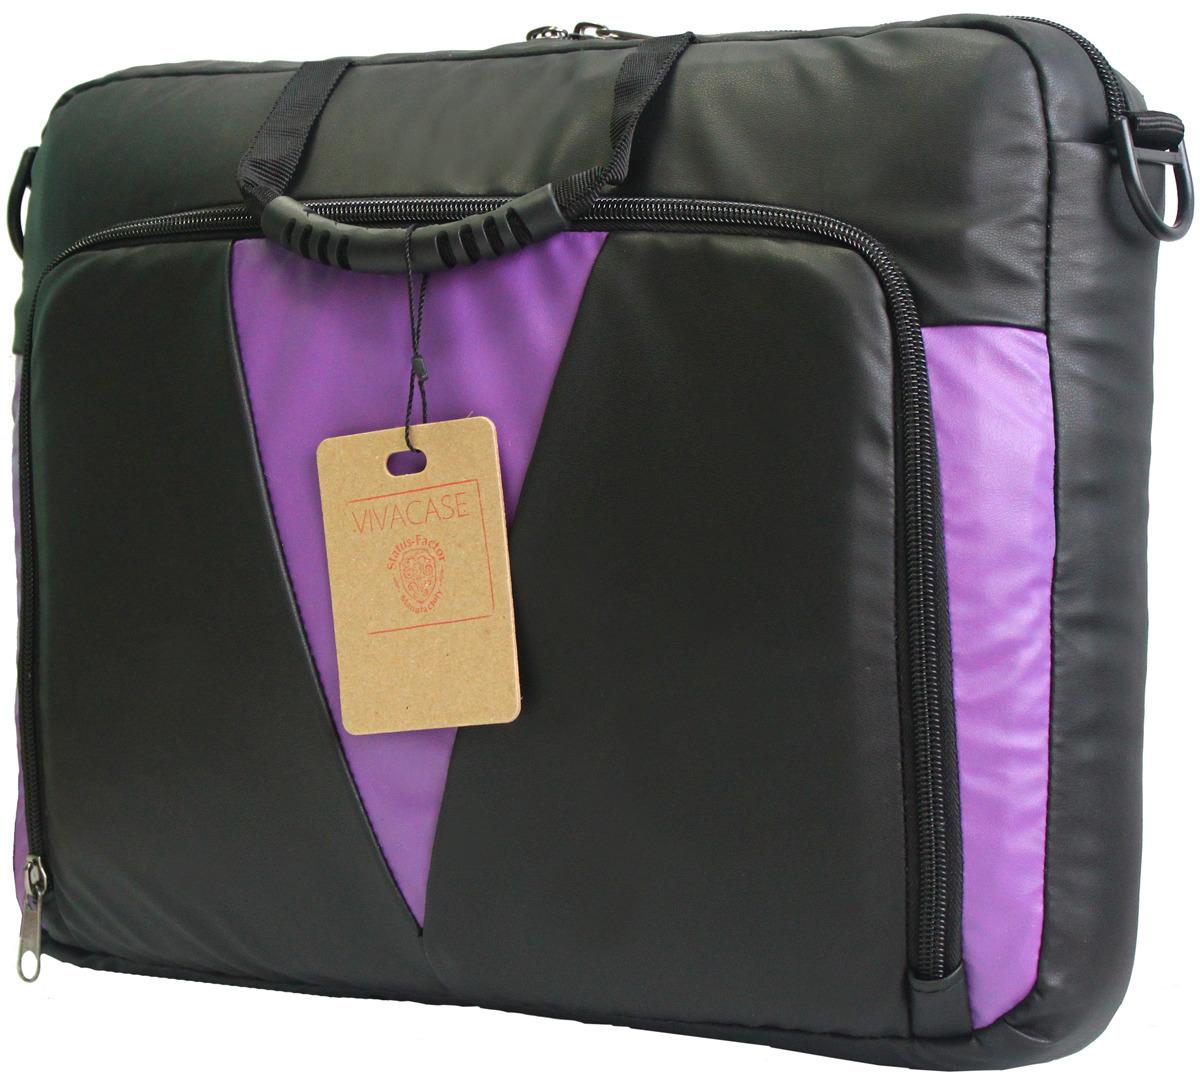 "Vivacase Daily, Black сумка для ноутбука 15,6"""